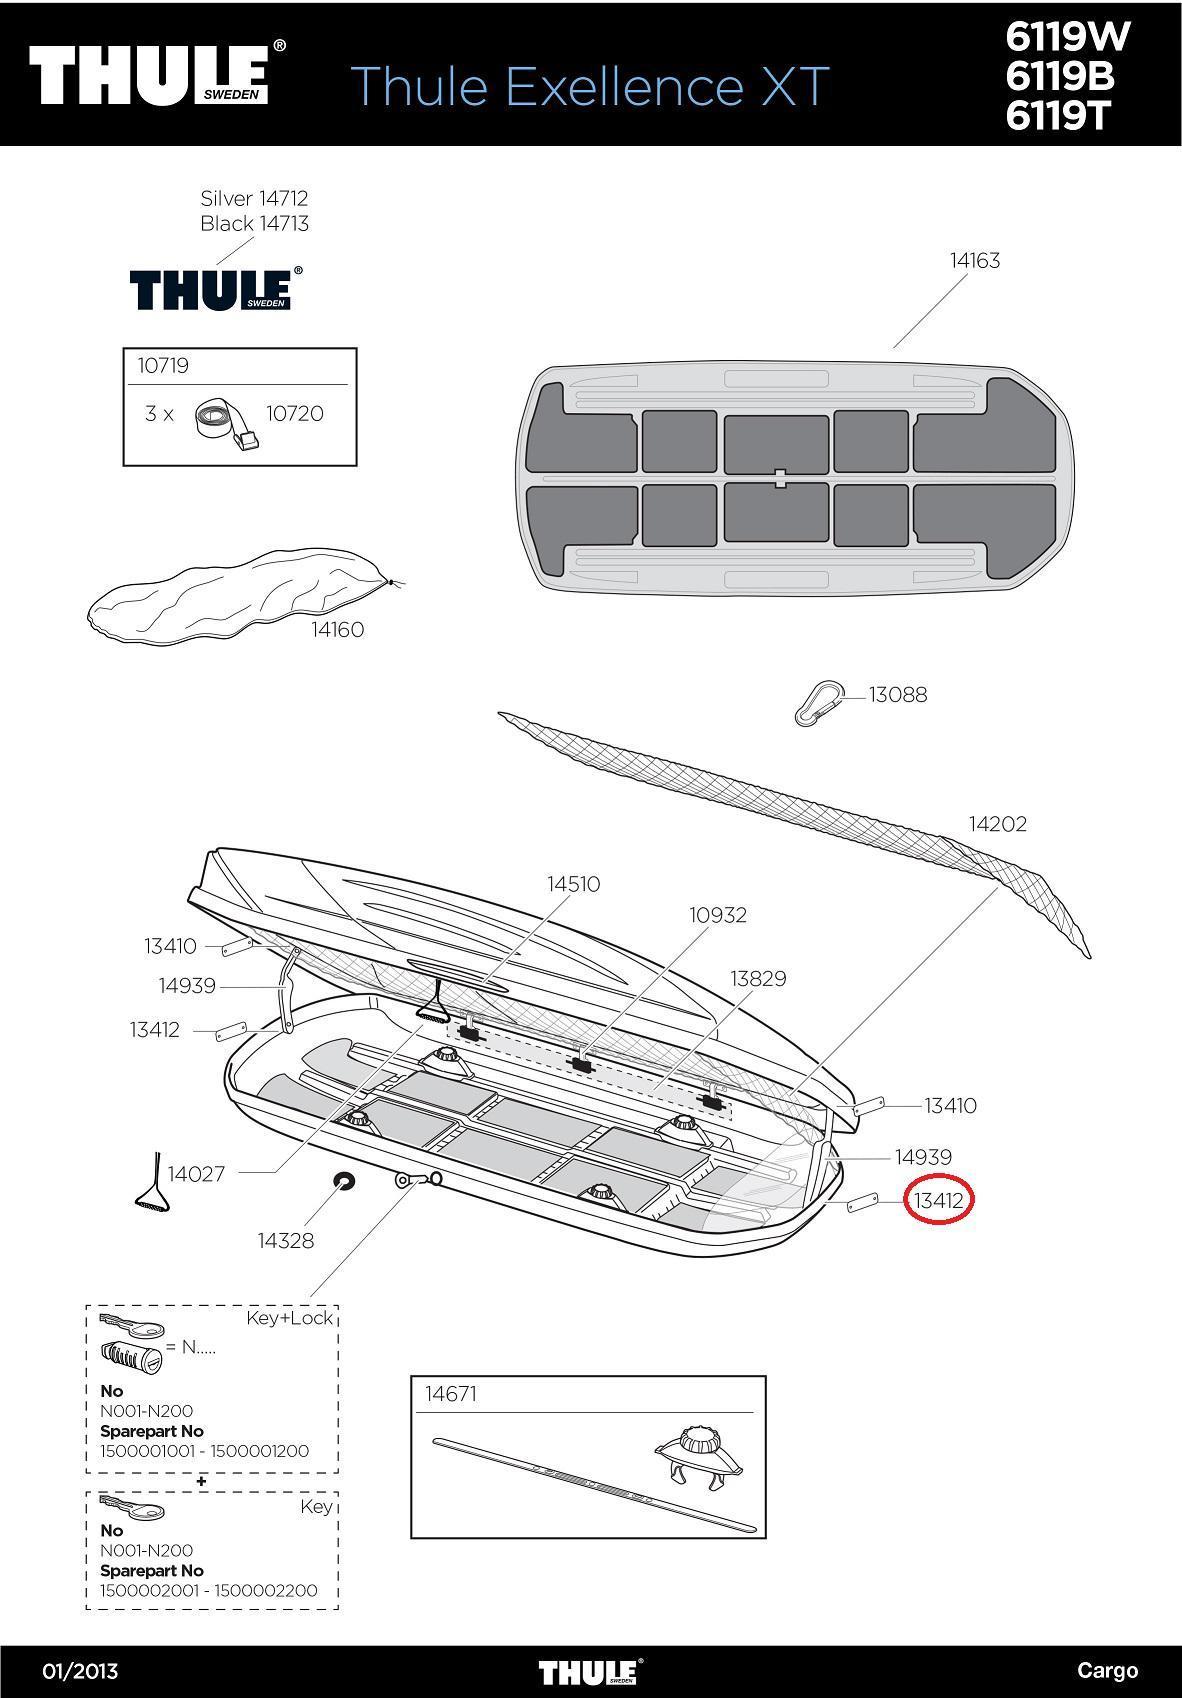 thule deckelst tze boden f r dachbox exellence motion. Black Bedroom Furniture Sets. Home Design Ideas